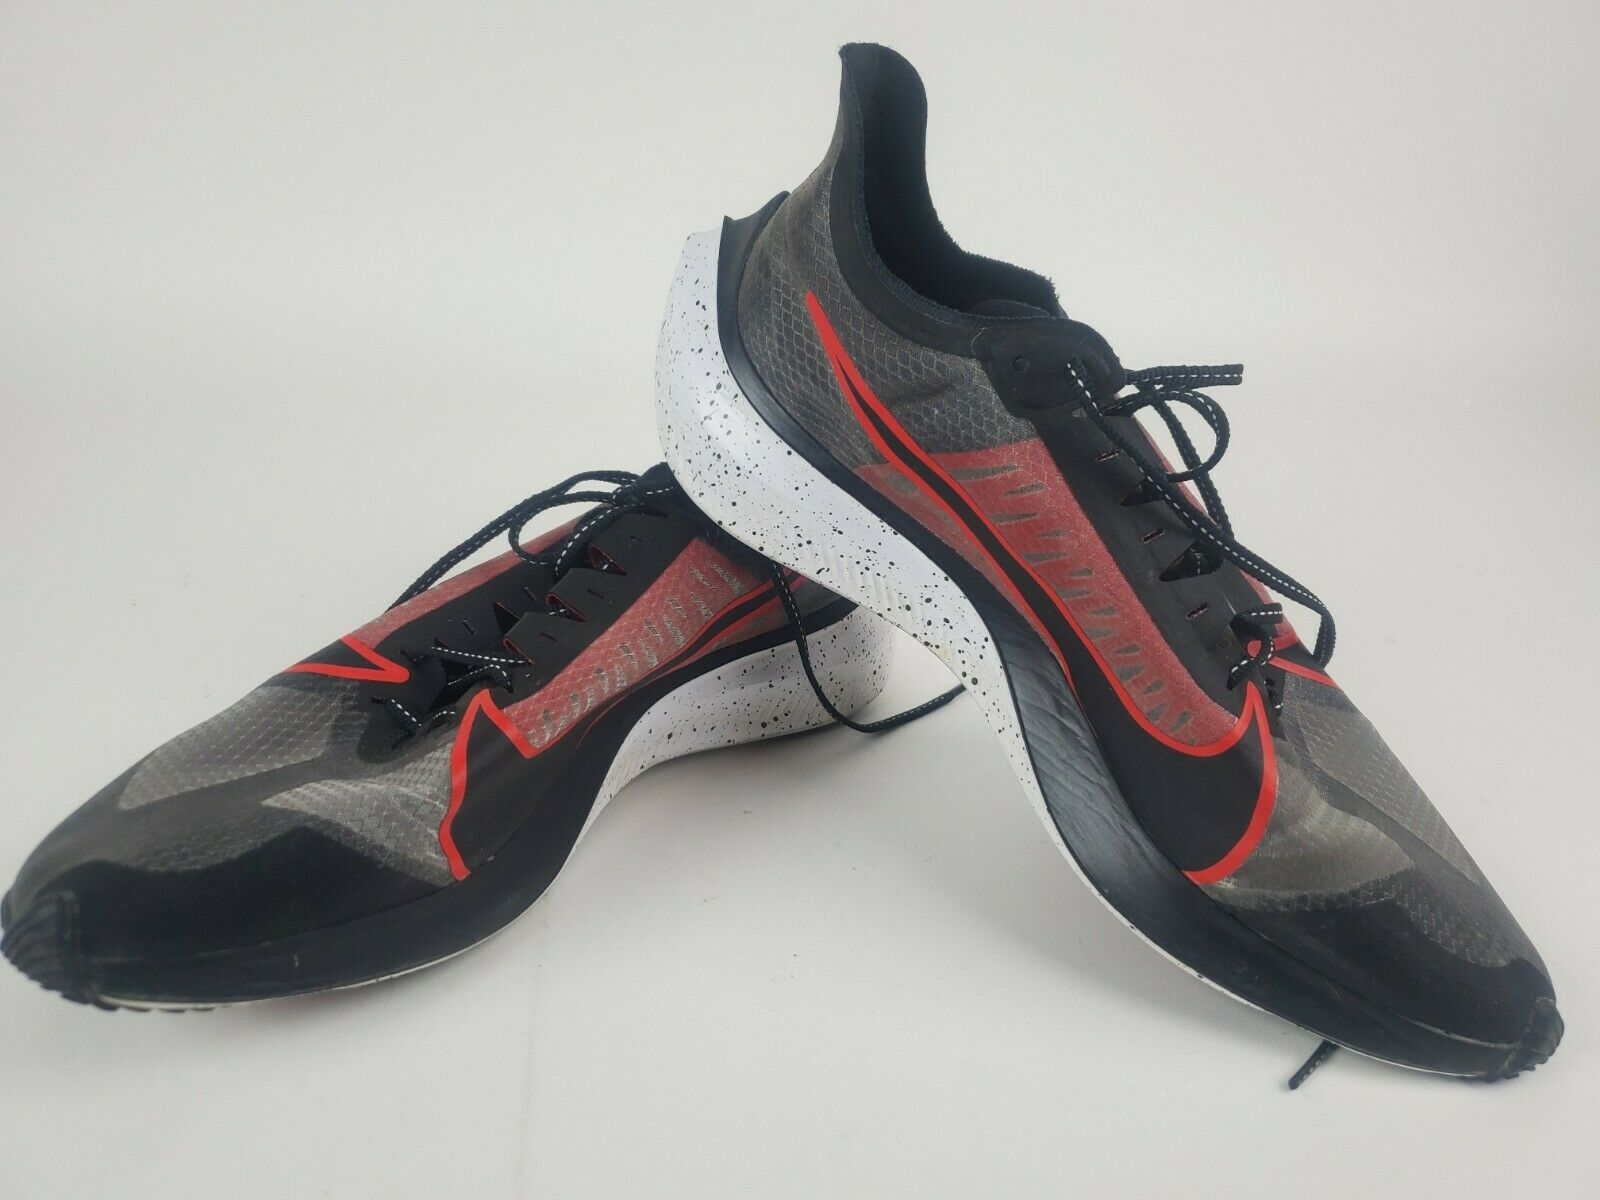 Nike Zoom Gravity Men's Running Shoe, Size 10.5 - Black ...